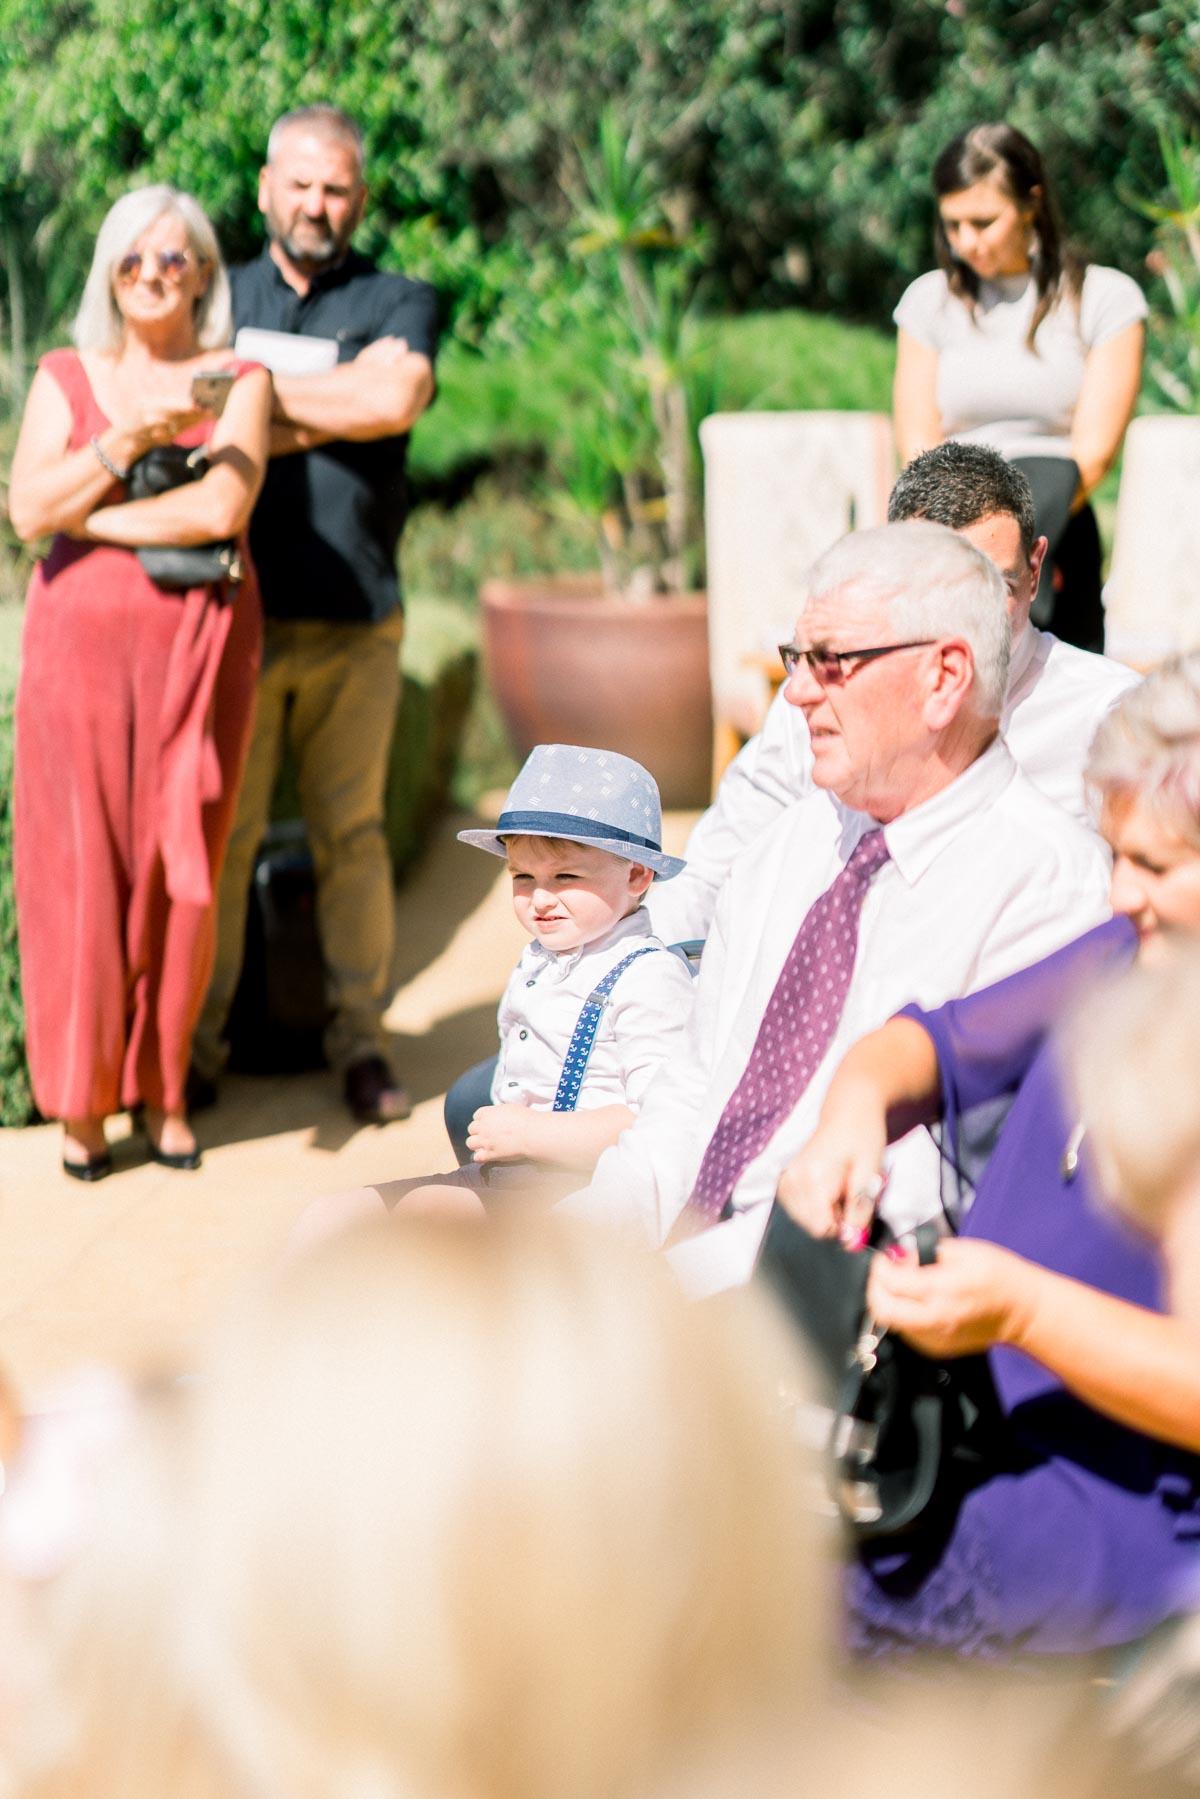 mt-eliza-mornington-peninsula-backyard-wedding-heart+soul-weddings-allison-matt-03233.jpg